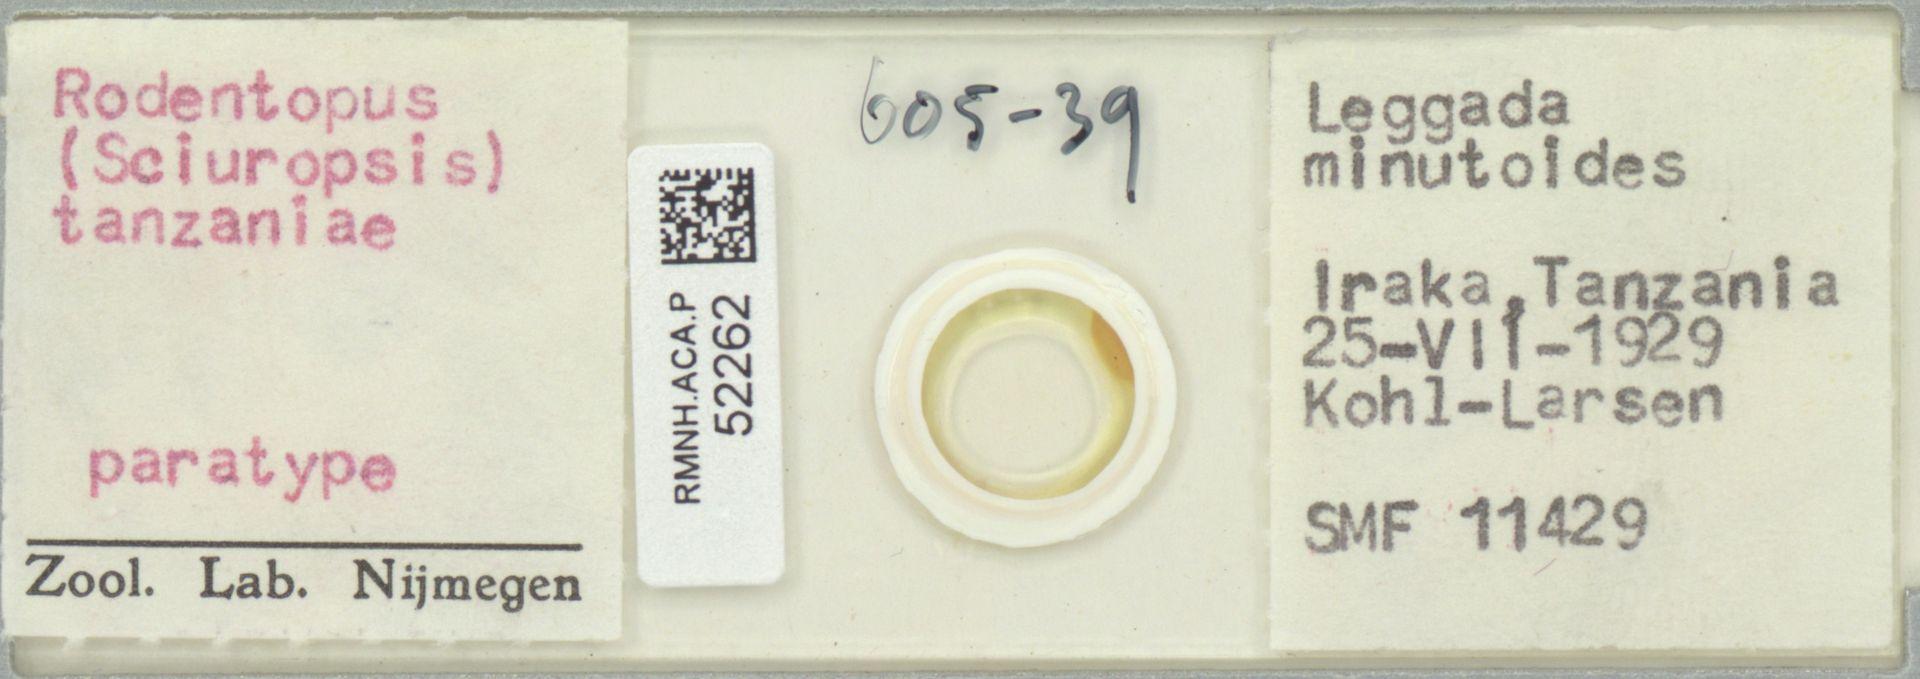 RMNH.ACA.P.52262 | Rodentopus (Sciuropsis) tanzaniae